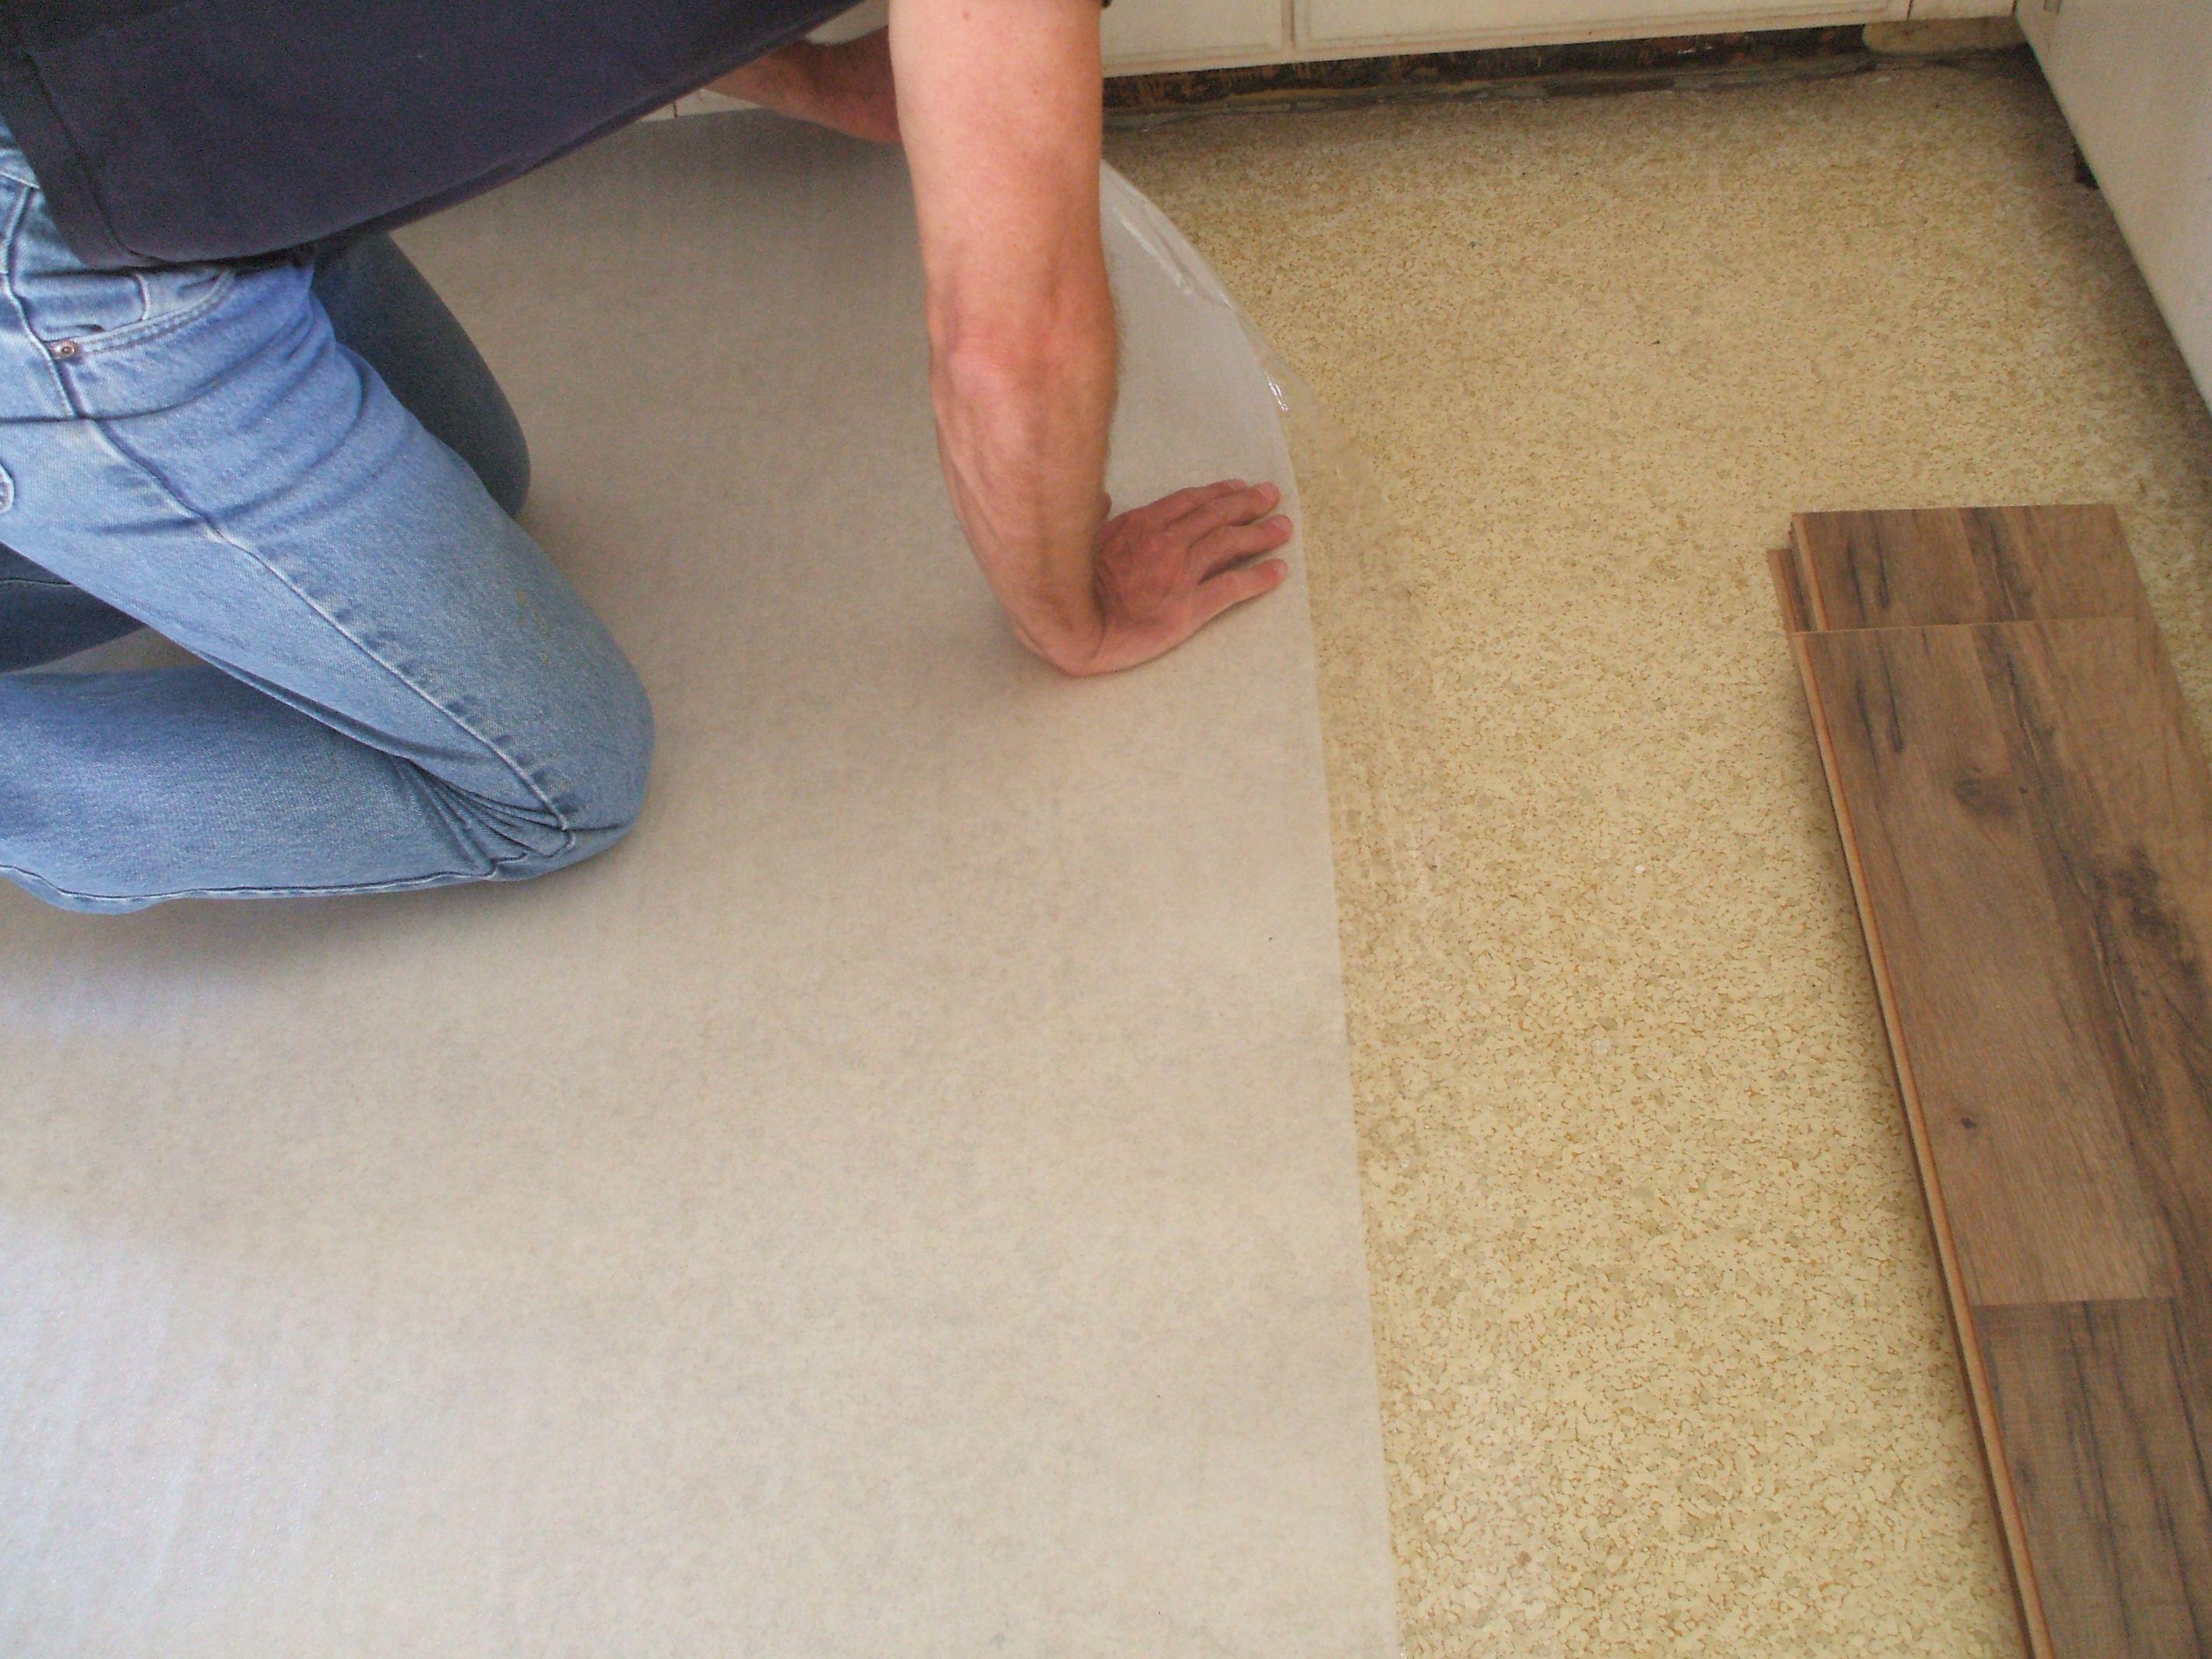 floating hardwood floor underlayment of laminate flooring installation made easy with installing laminate putting down underlayment 56a49e445f9b58b7d0d7dddd jpg